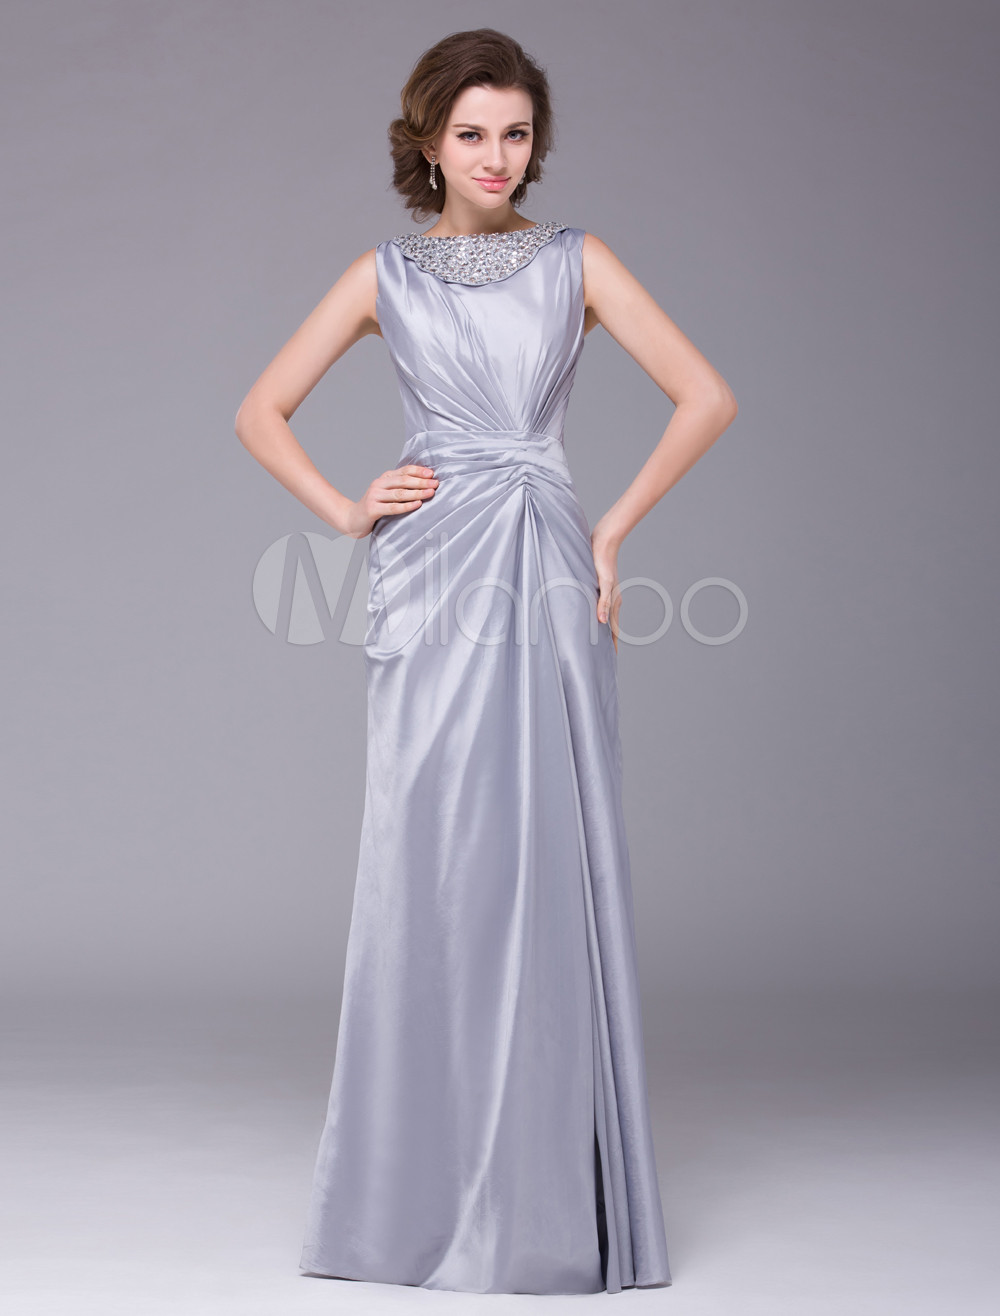 Silver Sleeveless Ruched Waistline Taffeta Mother of the Bride Dress Wedding Guest Dress photo